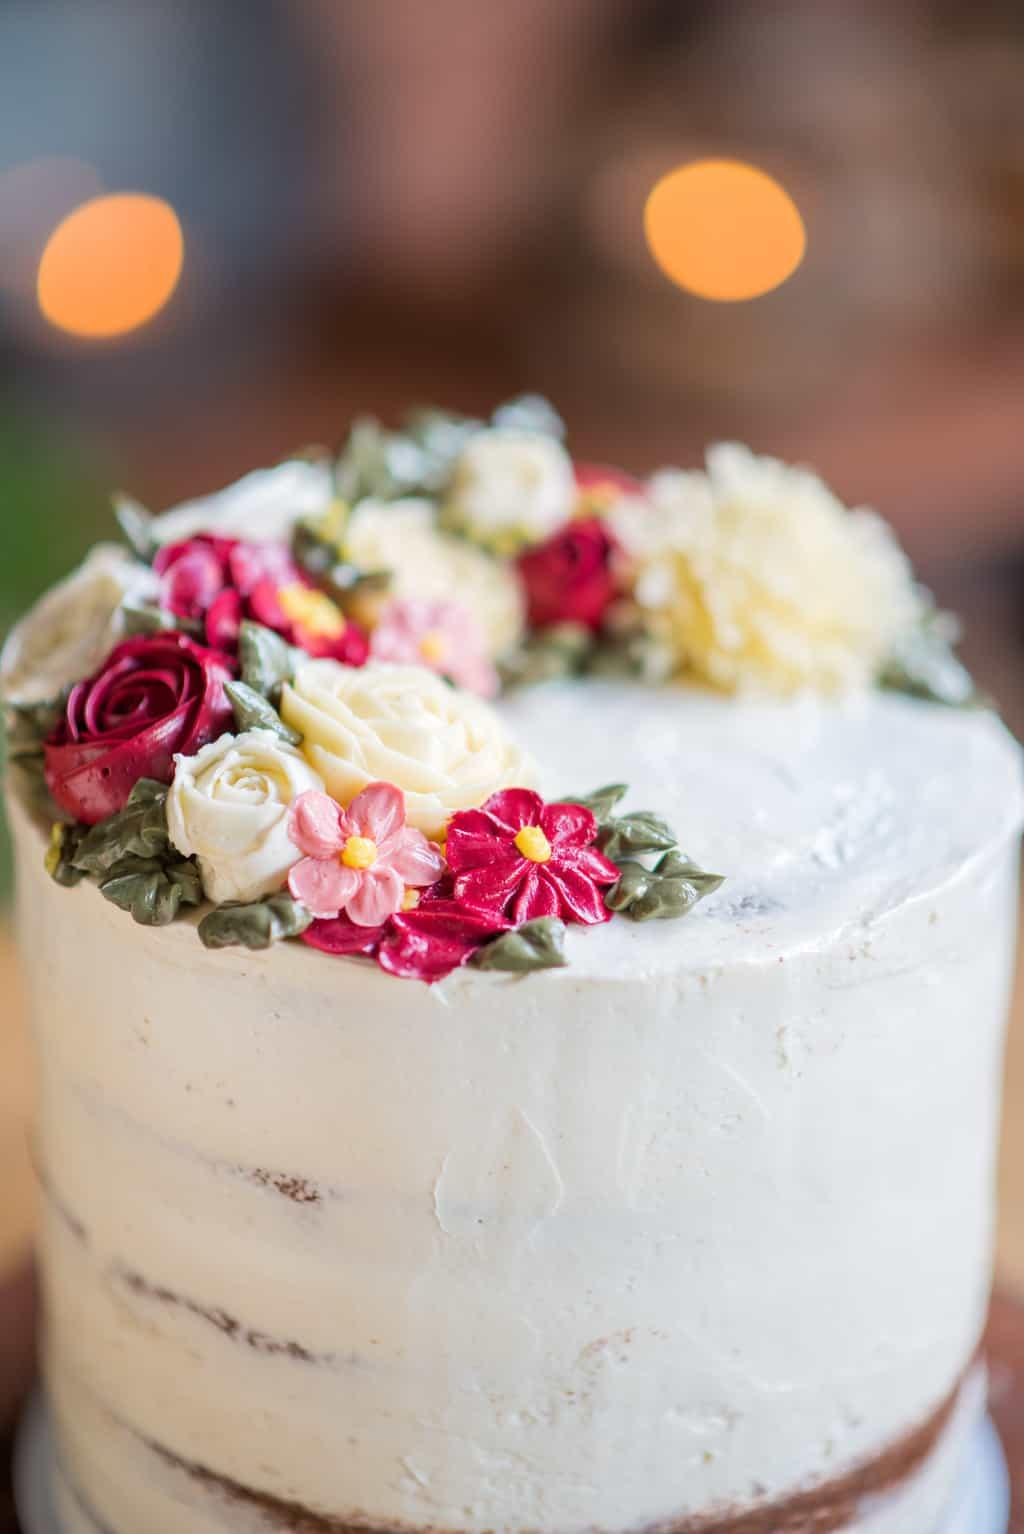 flower-cake-make-a-cake-1